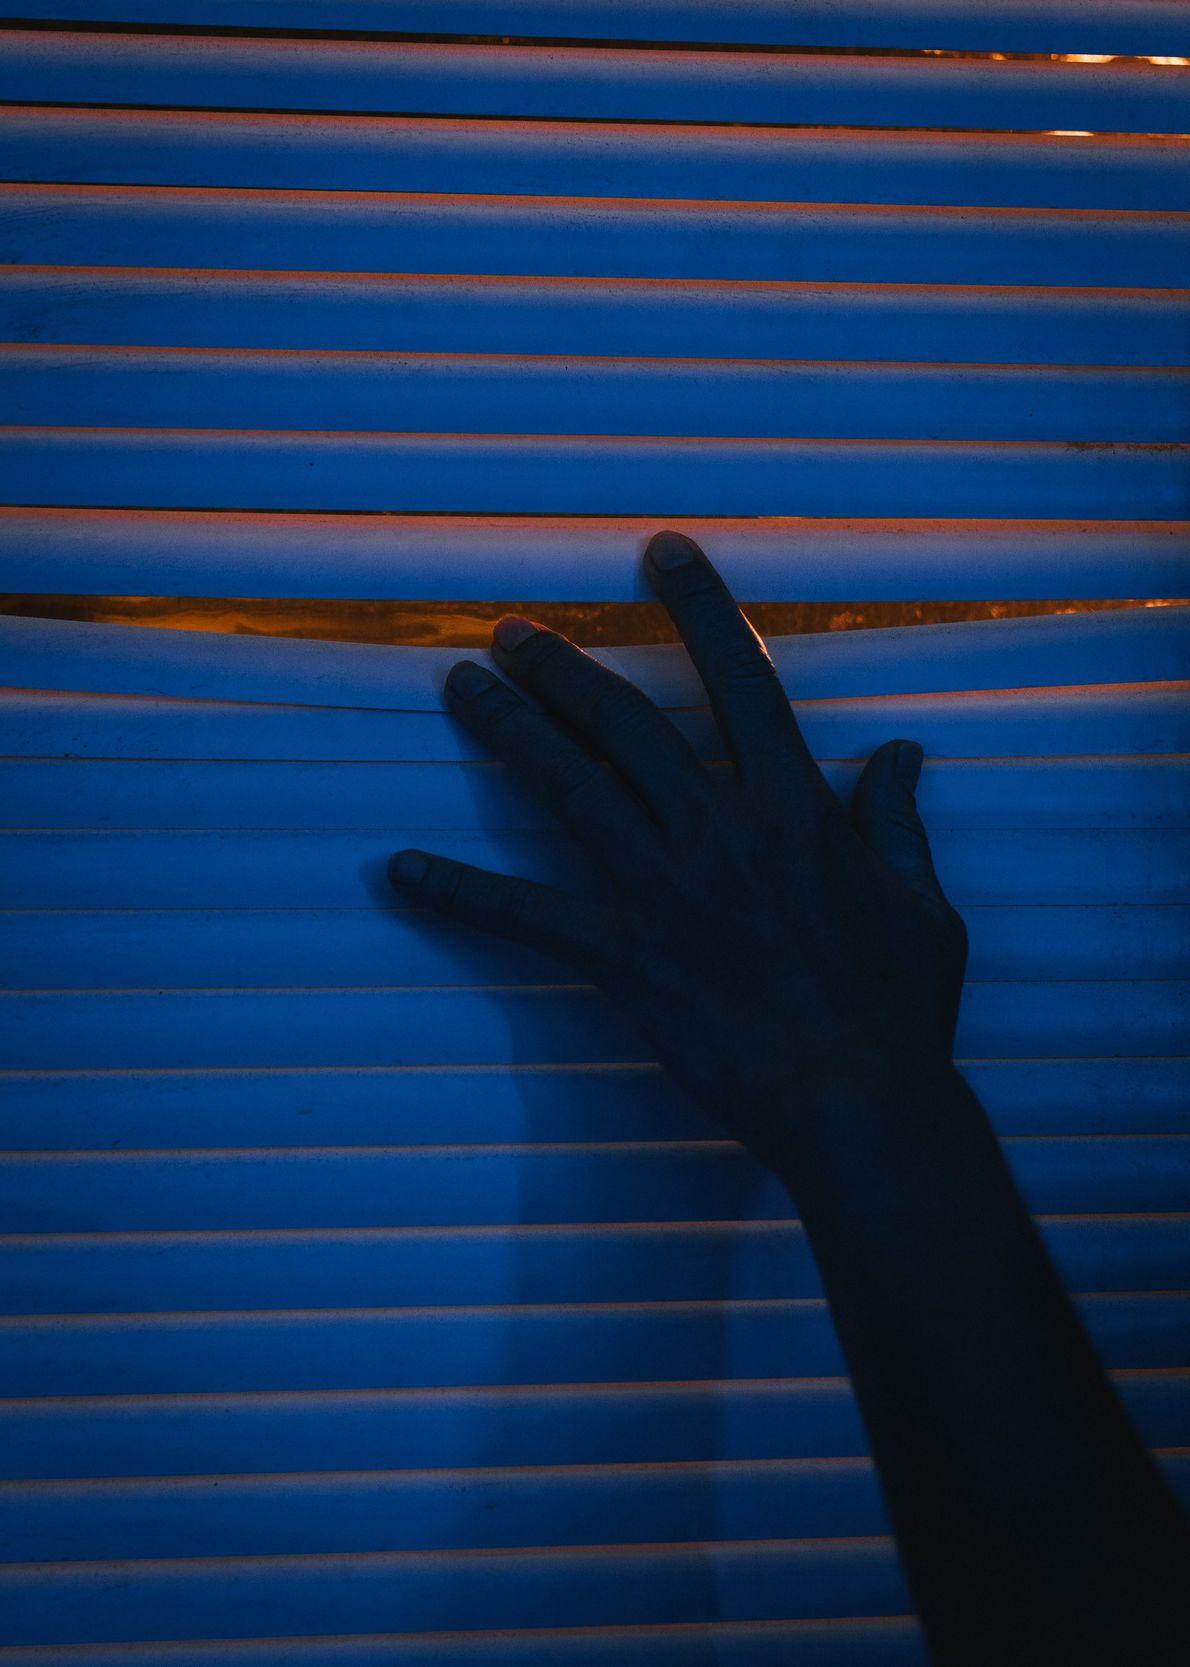 Field crew member Aline Decadi peeks through a window blind in the crew's quarters.